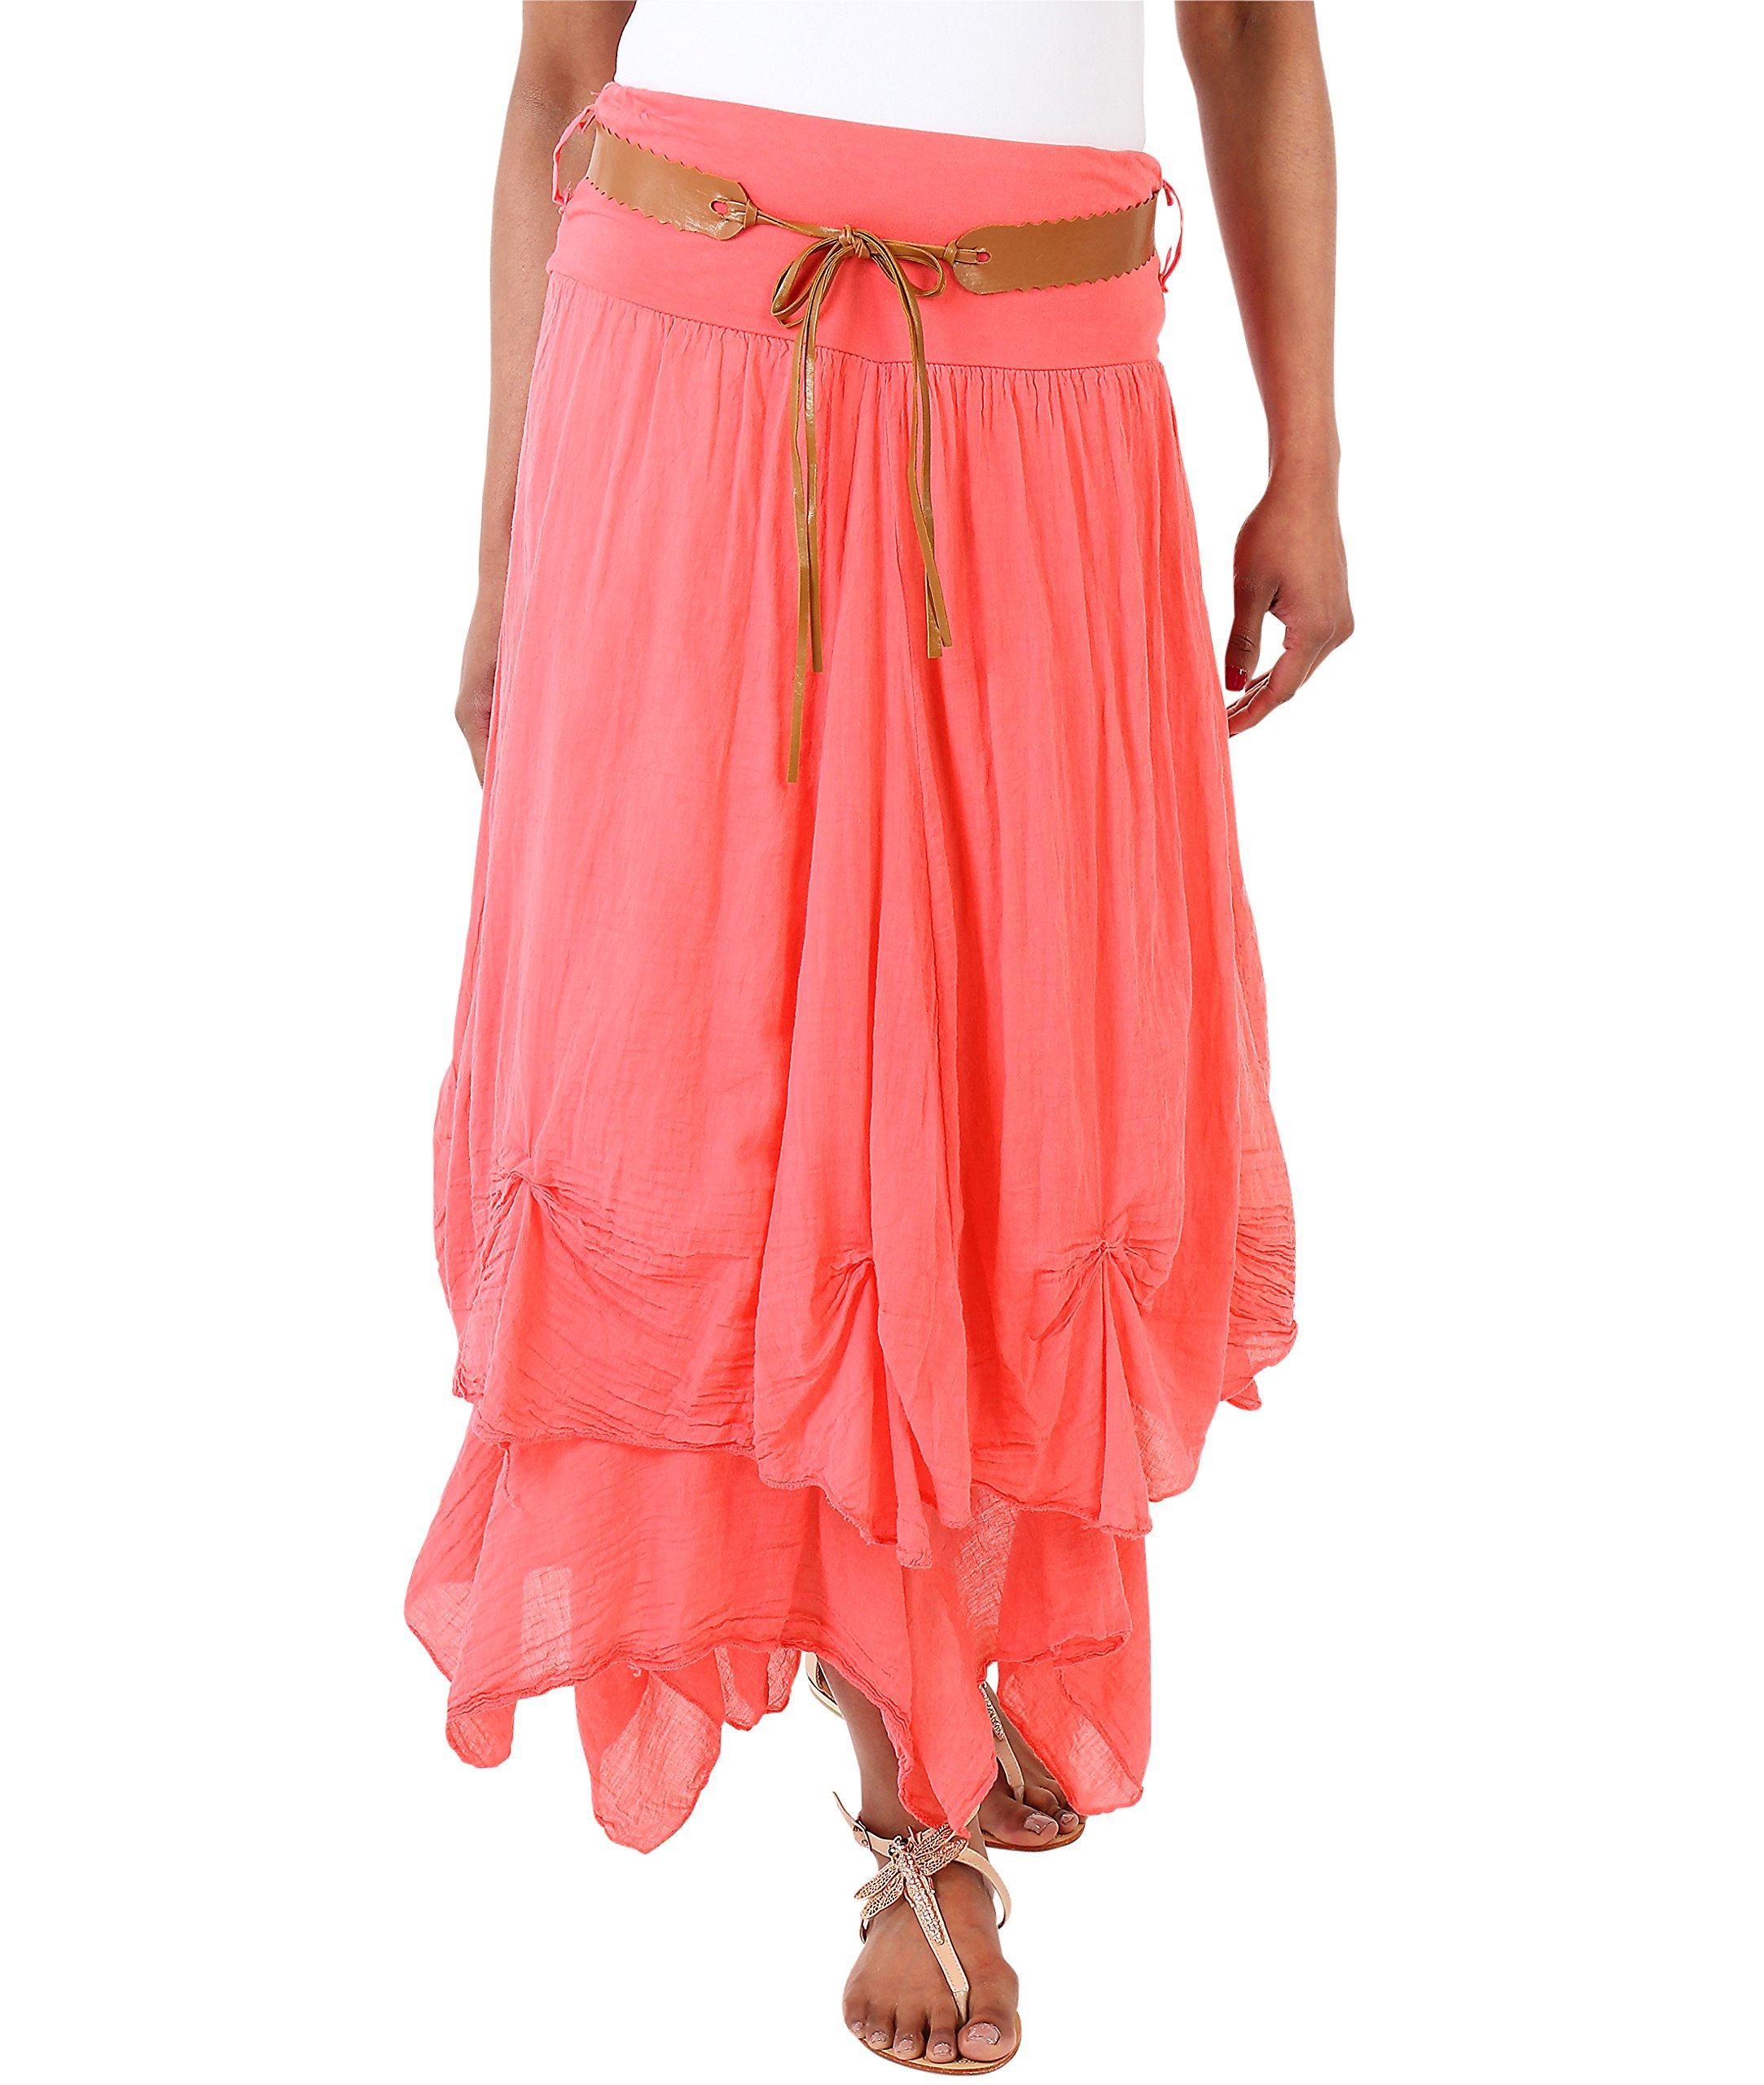 KRISP Cotton Skirt (FBA_USA7847-COR-08)